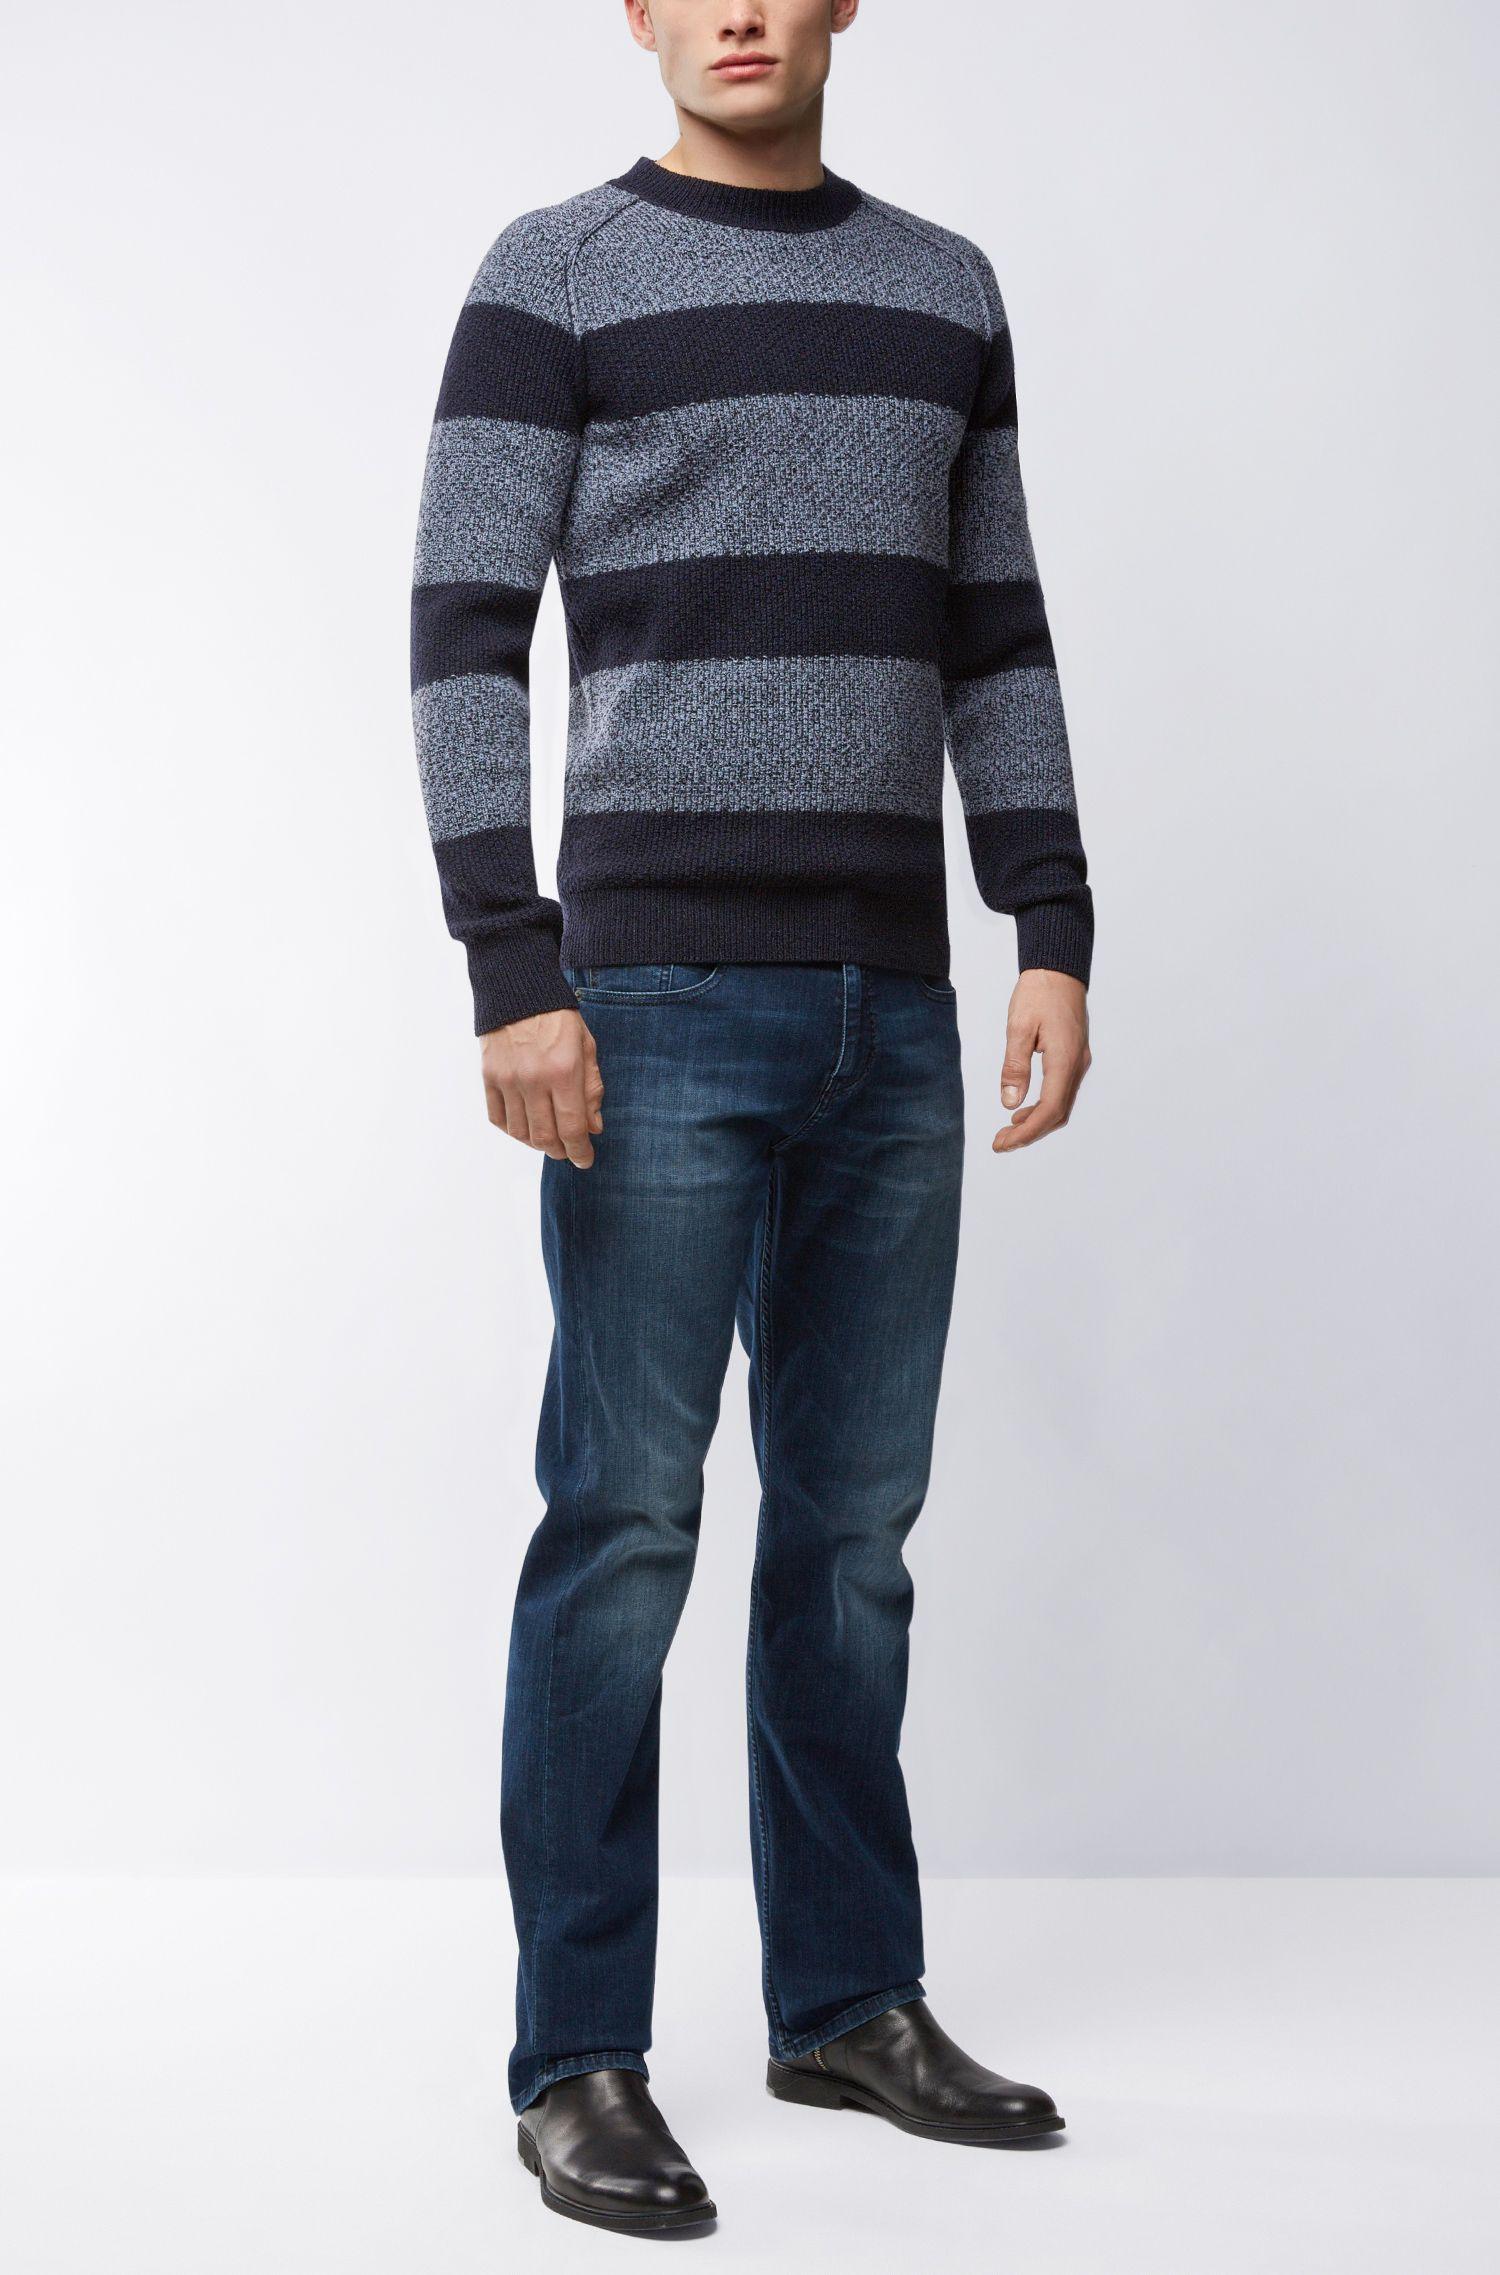 'Arbieri' | Striped Cotton-Wool Blend Sweater, Dark Blue